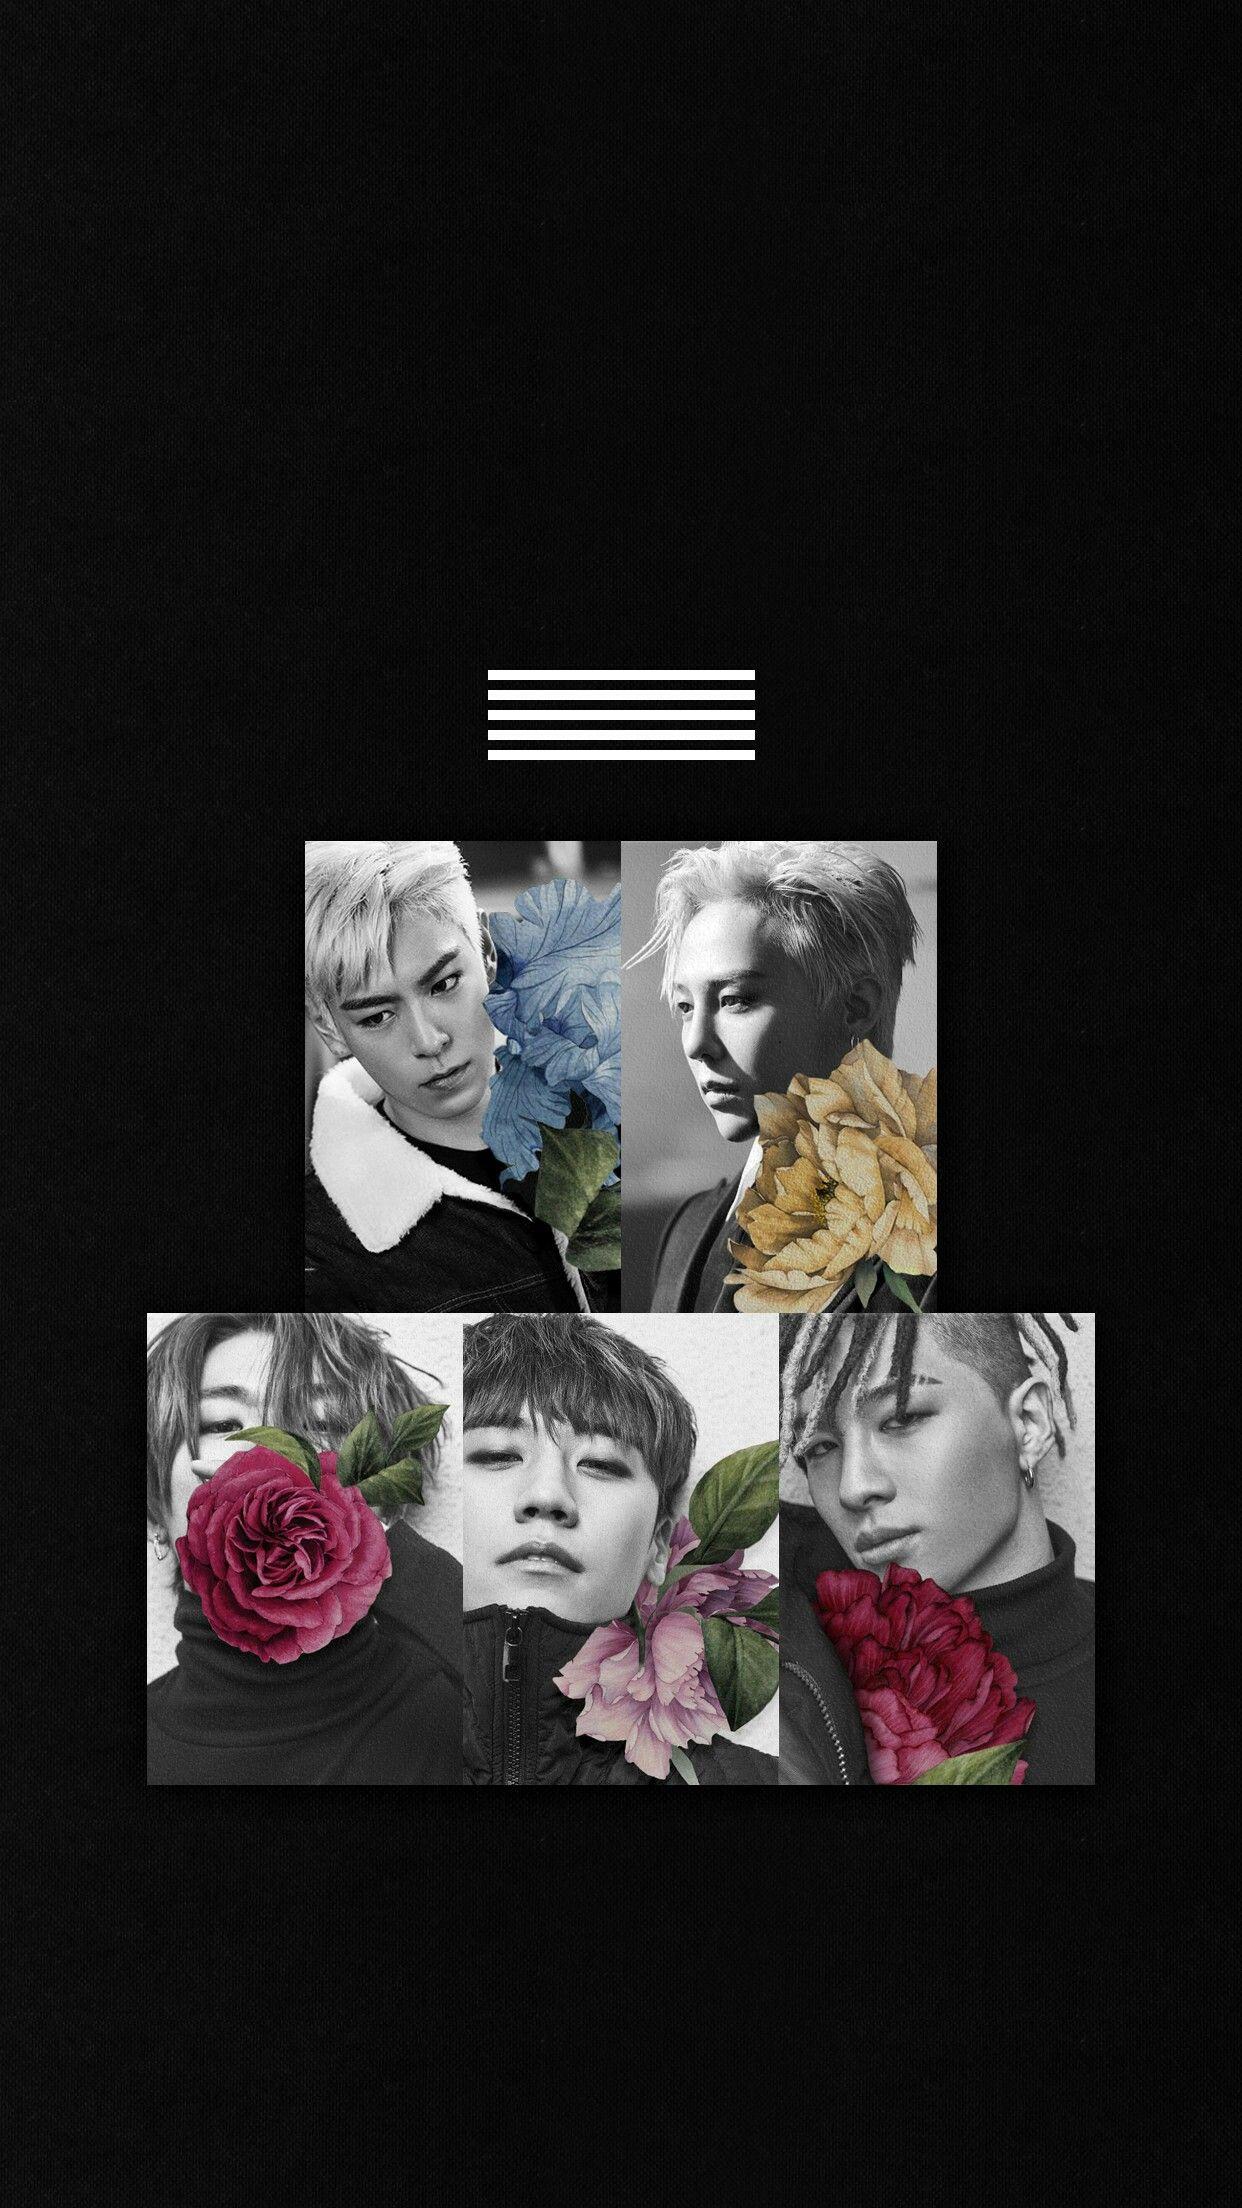 Foreverwithyou Bigbang Bigbang 壁紙 Iphone 壁紙 ビッベン